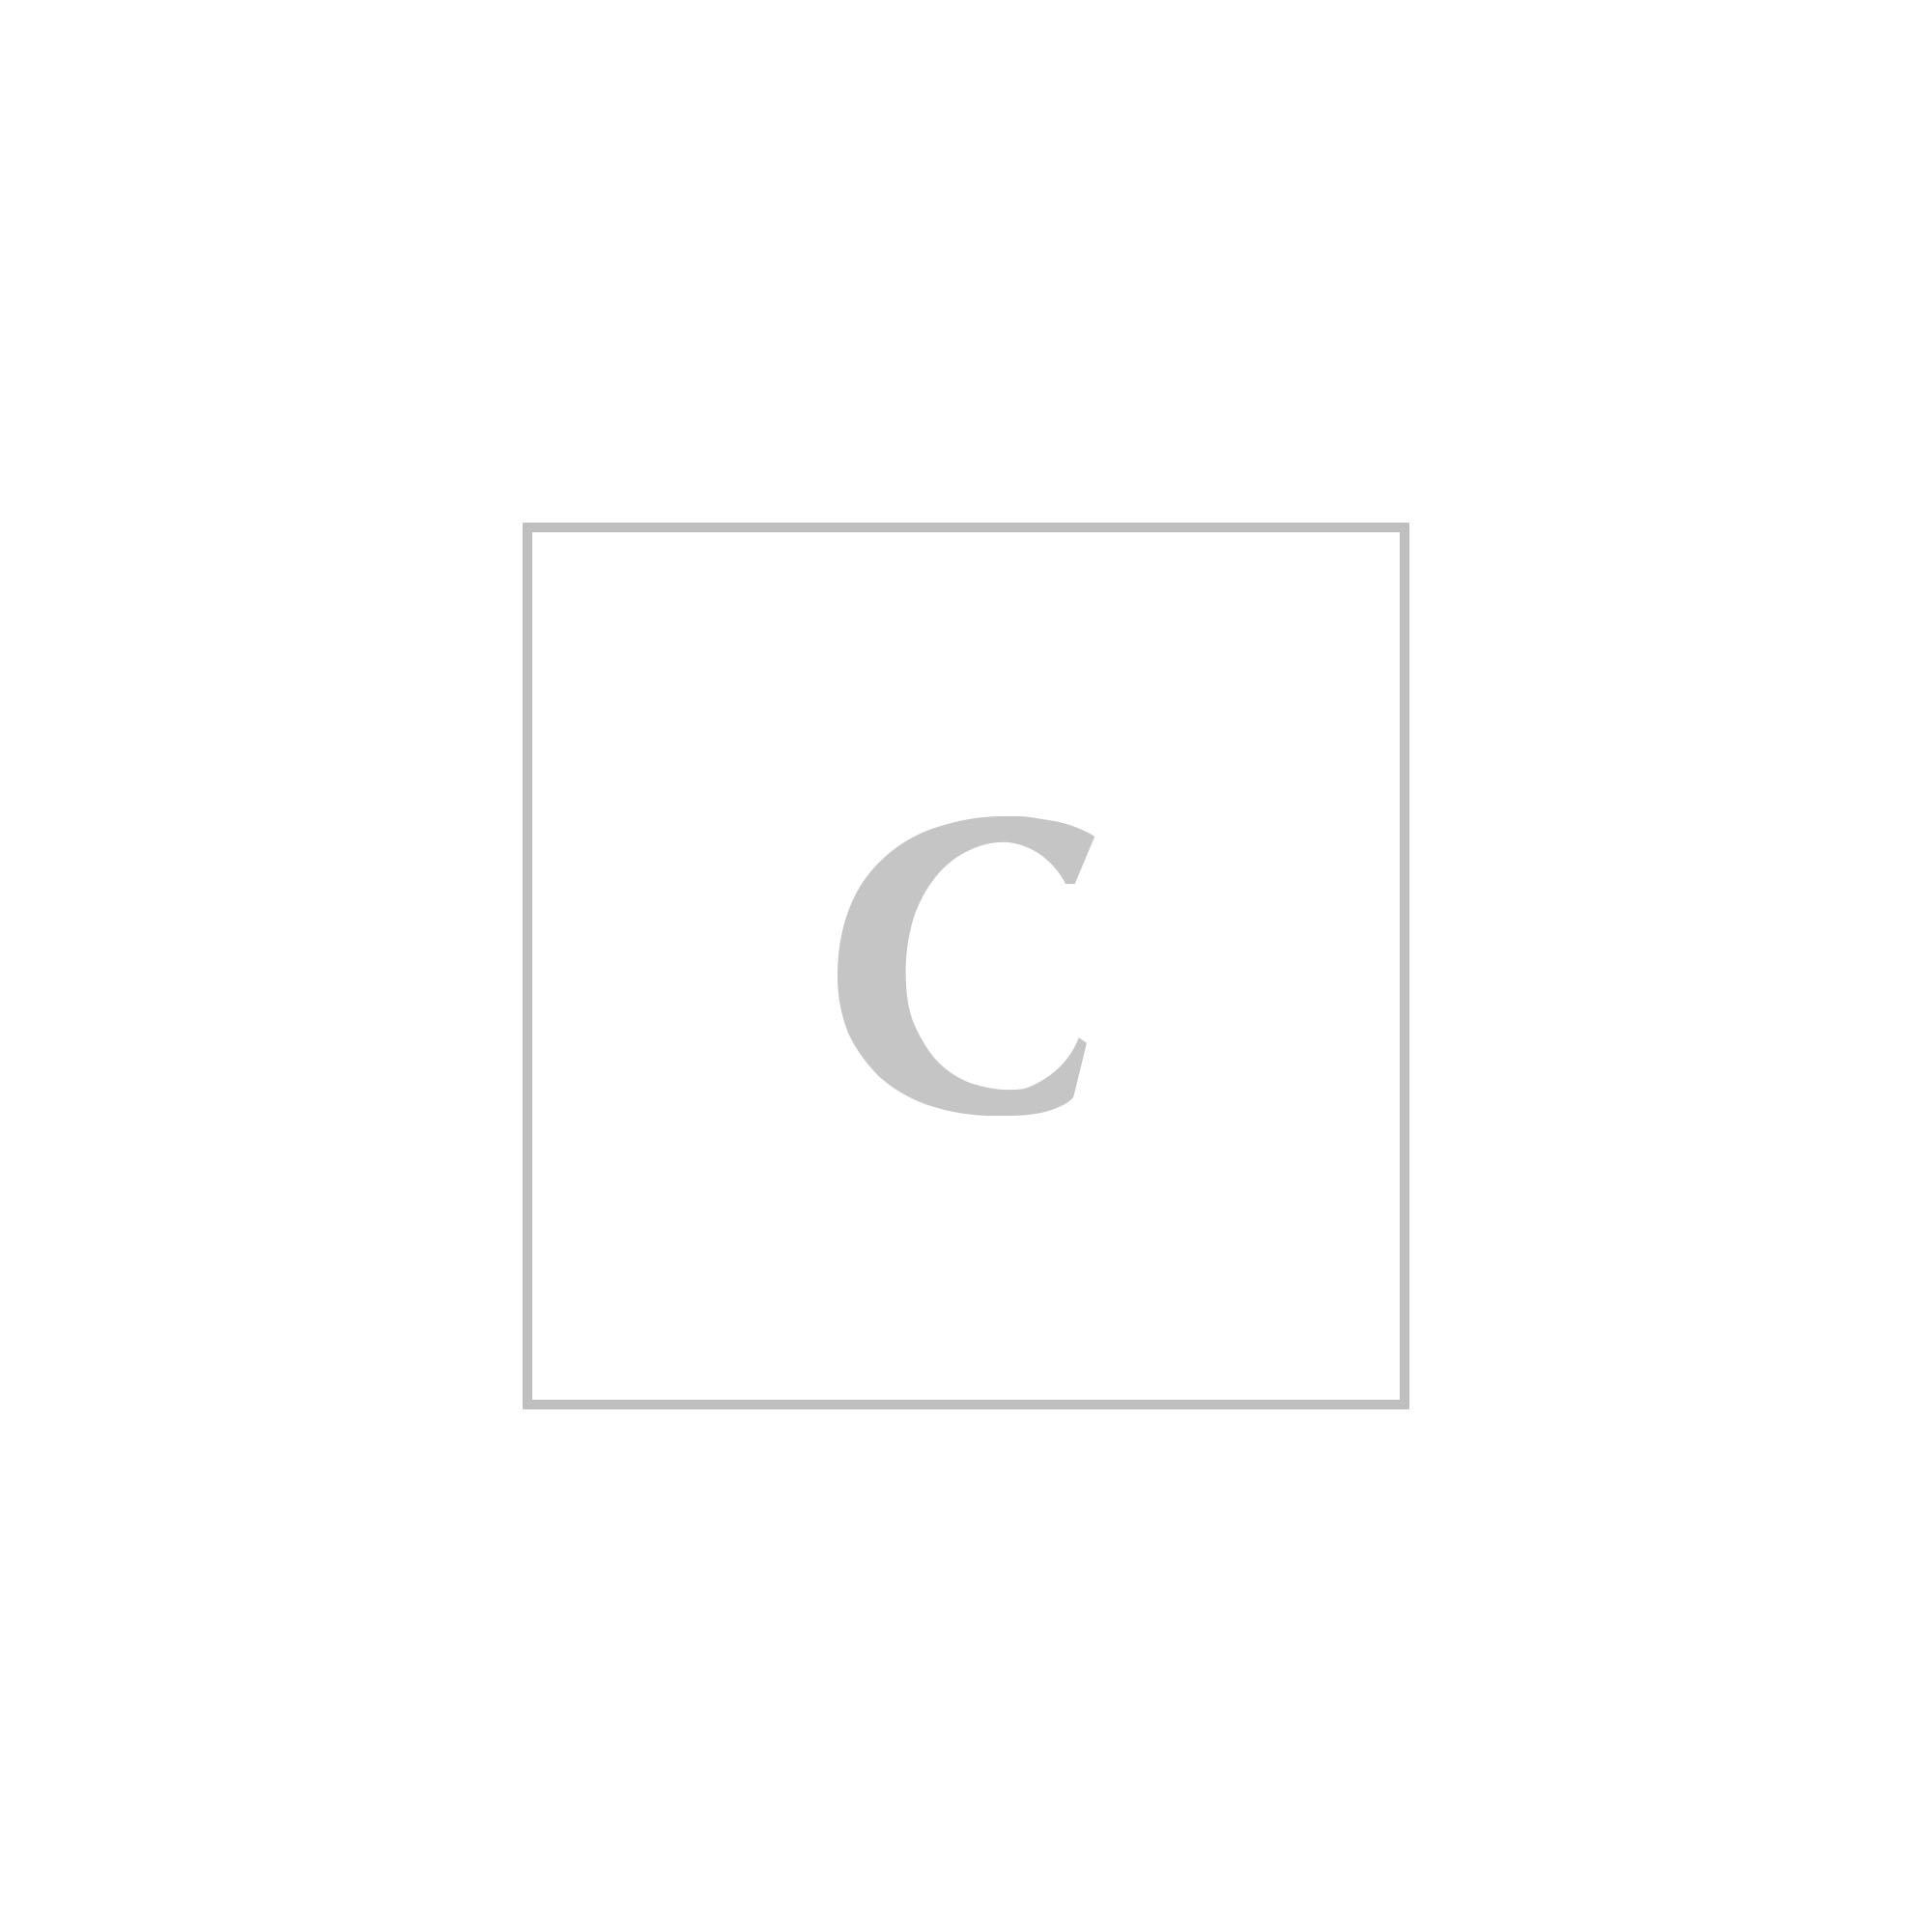 Prada abito cloquet fiore garza lino